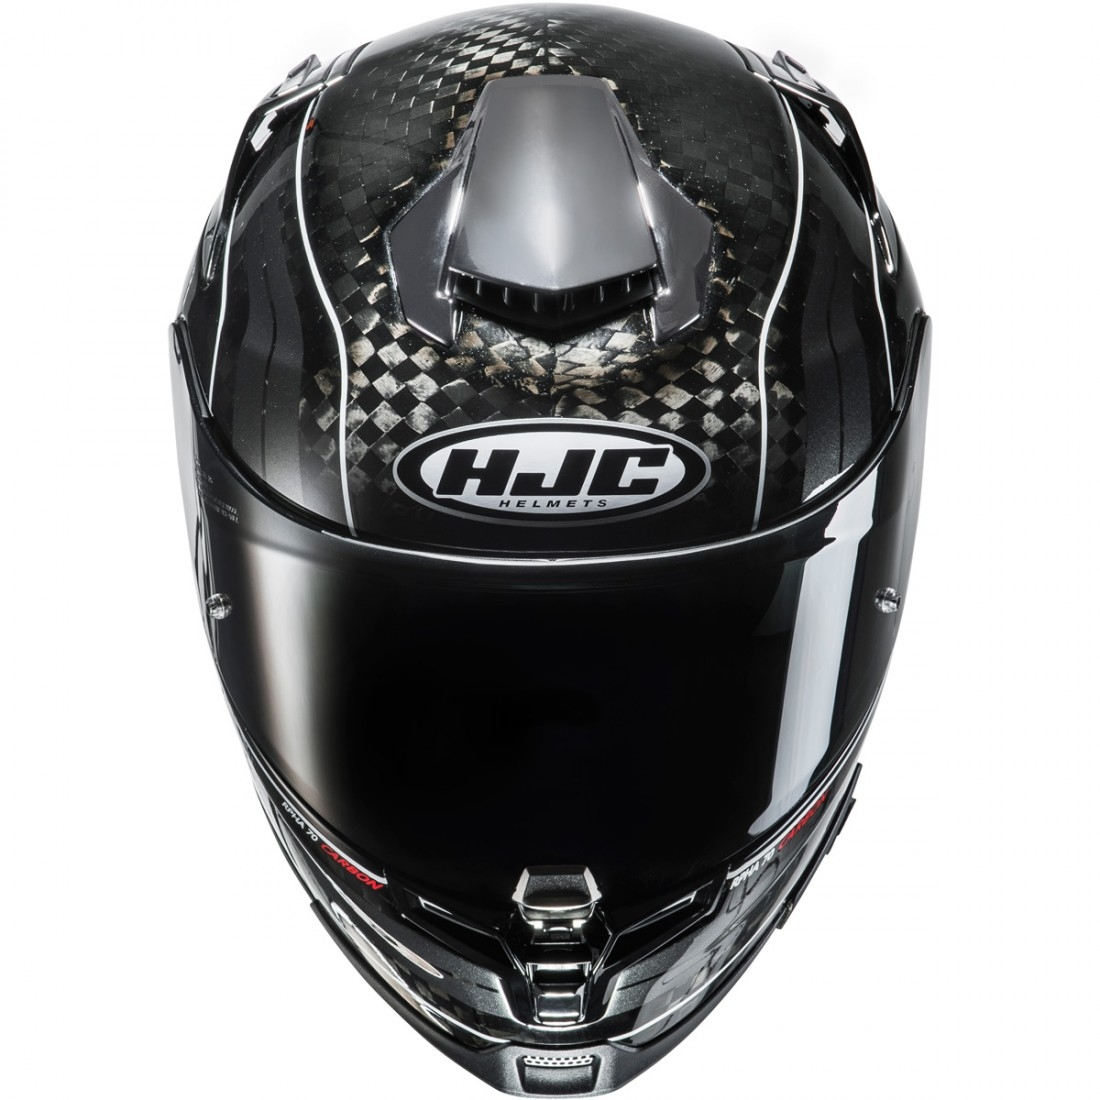 hjc rpha 70 carbon hydrus mc 5 helmet motocard. Black Bedroom Furniture Sets. Home Design Ideas